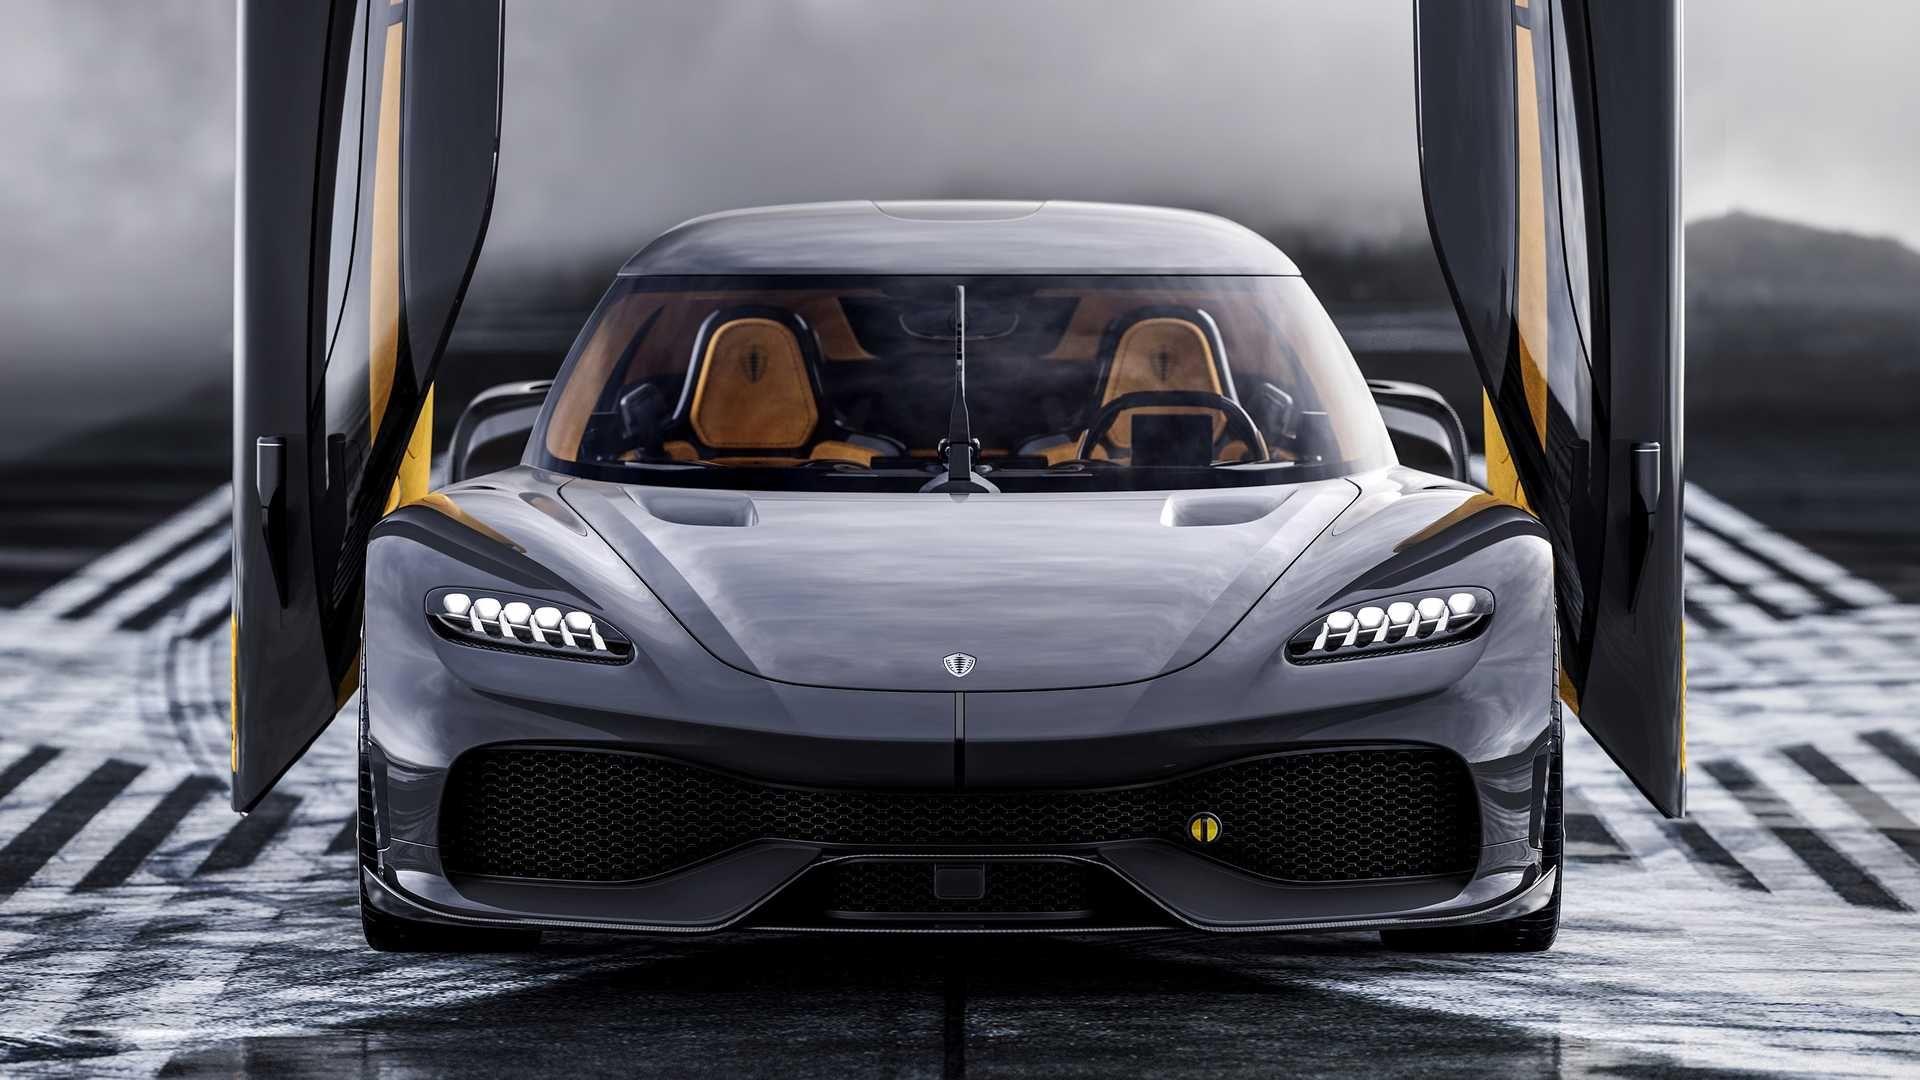 Koenigsegg Gemera Is A 4 Seat Hypercar Pumping Out 1 700hp Techeblog Koenigsegg Mercedes Sports Car Sports Cars Lamborghini